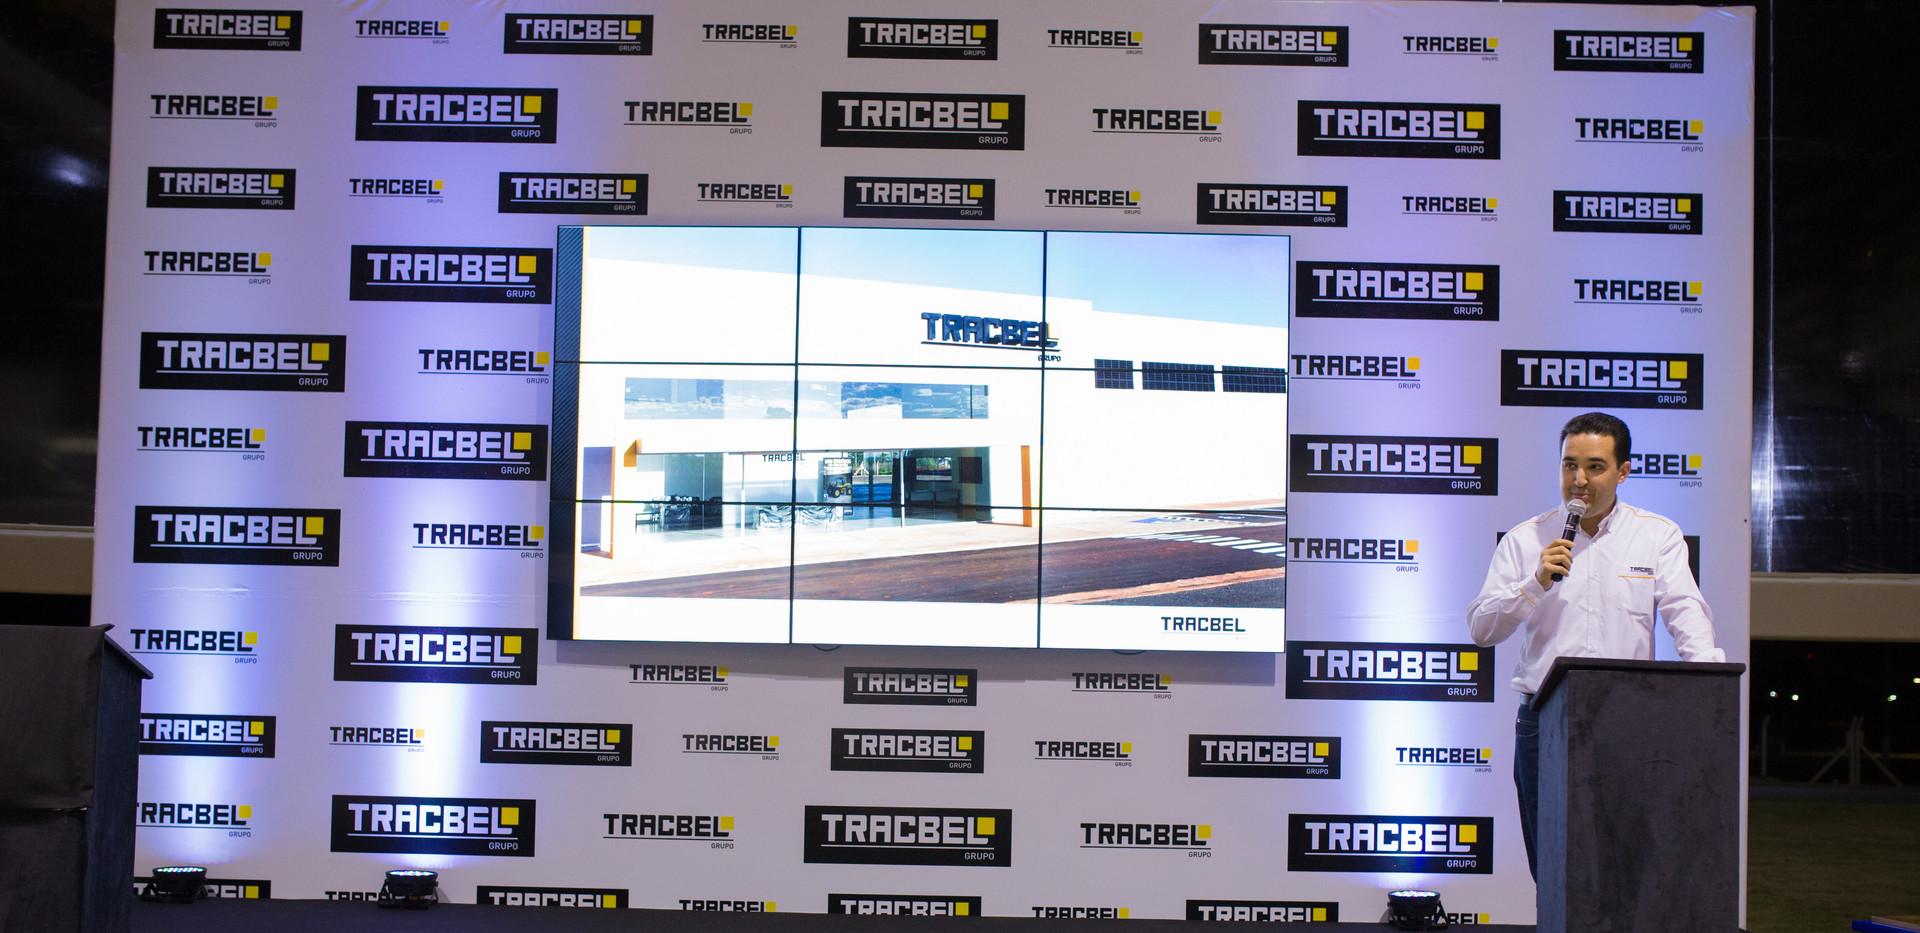 tracbel-bebedouro-158.jpg